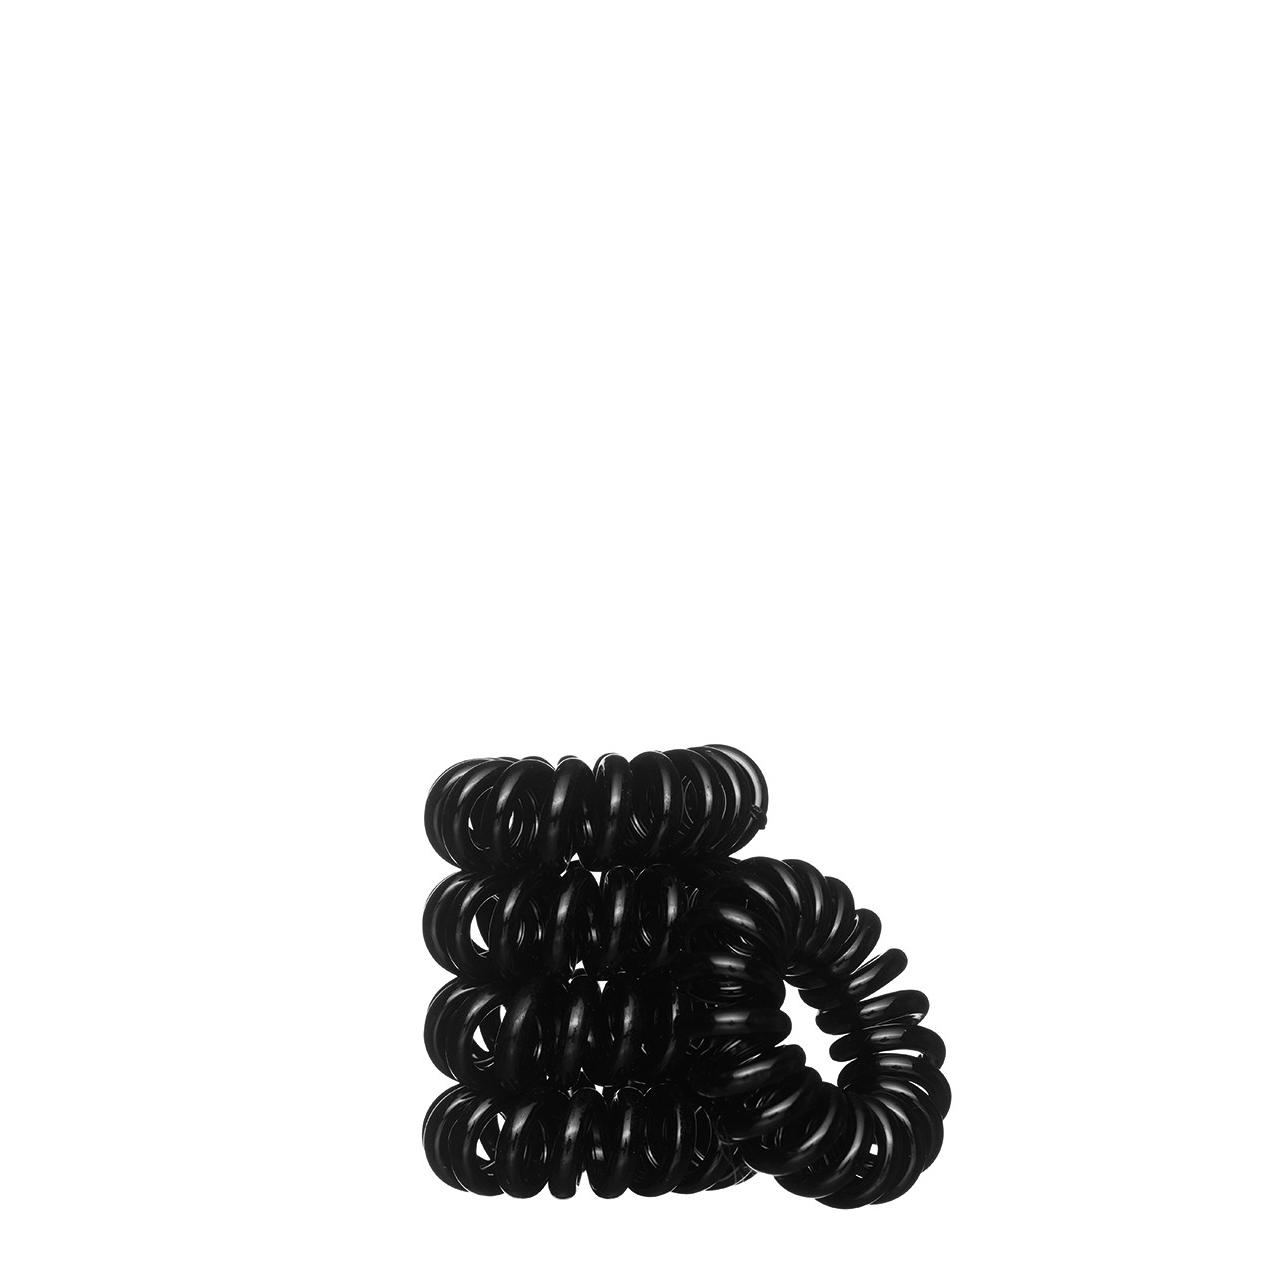 Spiralinės plaukų gumutės, juodos Bella Nova 5 vnt Nr. 92-0